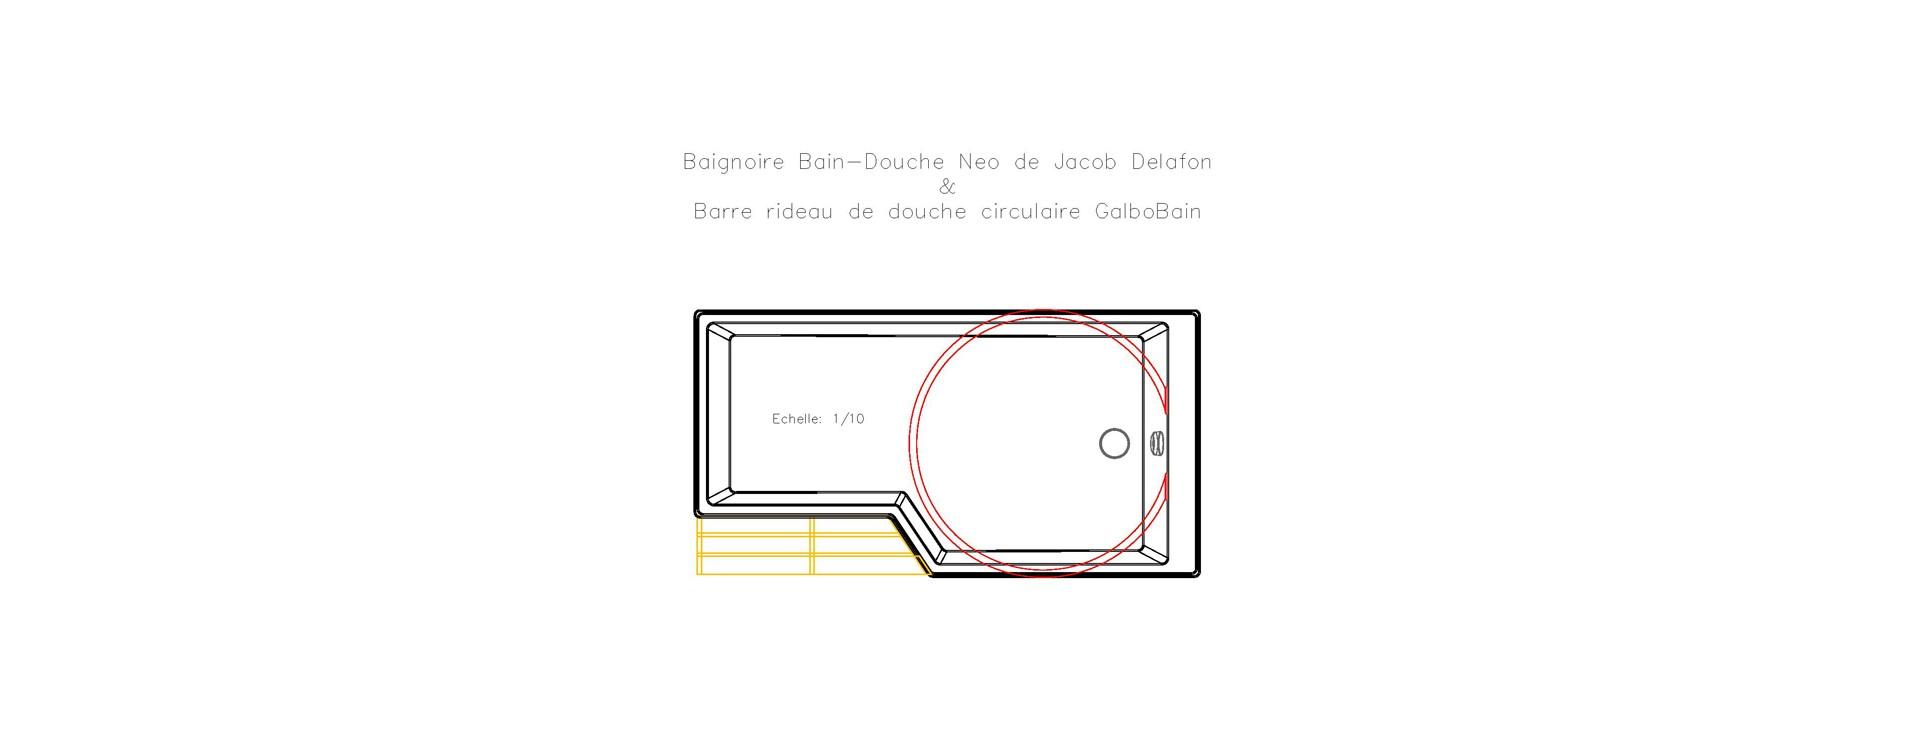 Baignoire Neo De Jacob Delafon Et Barre Circulaire